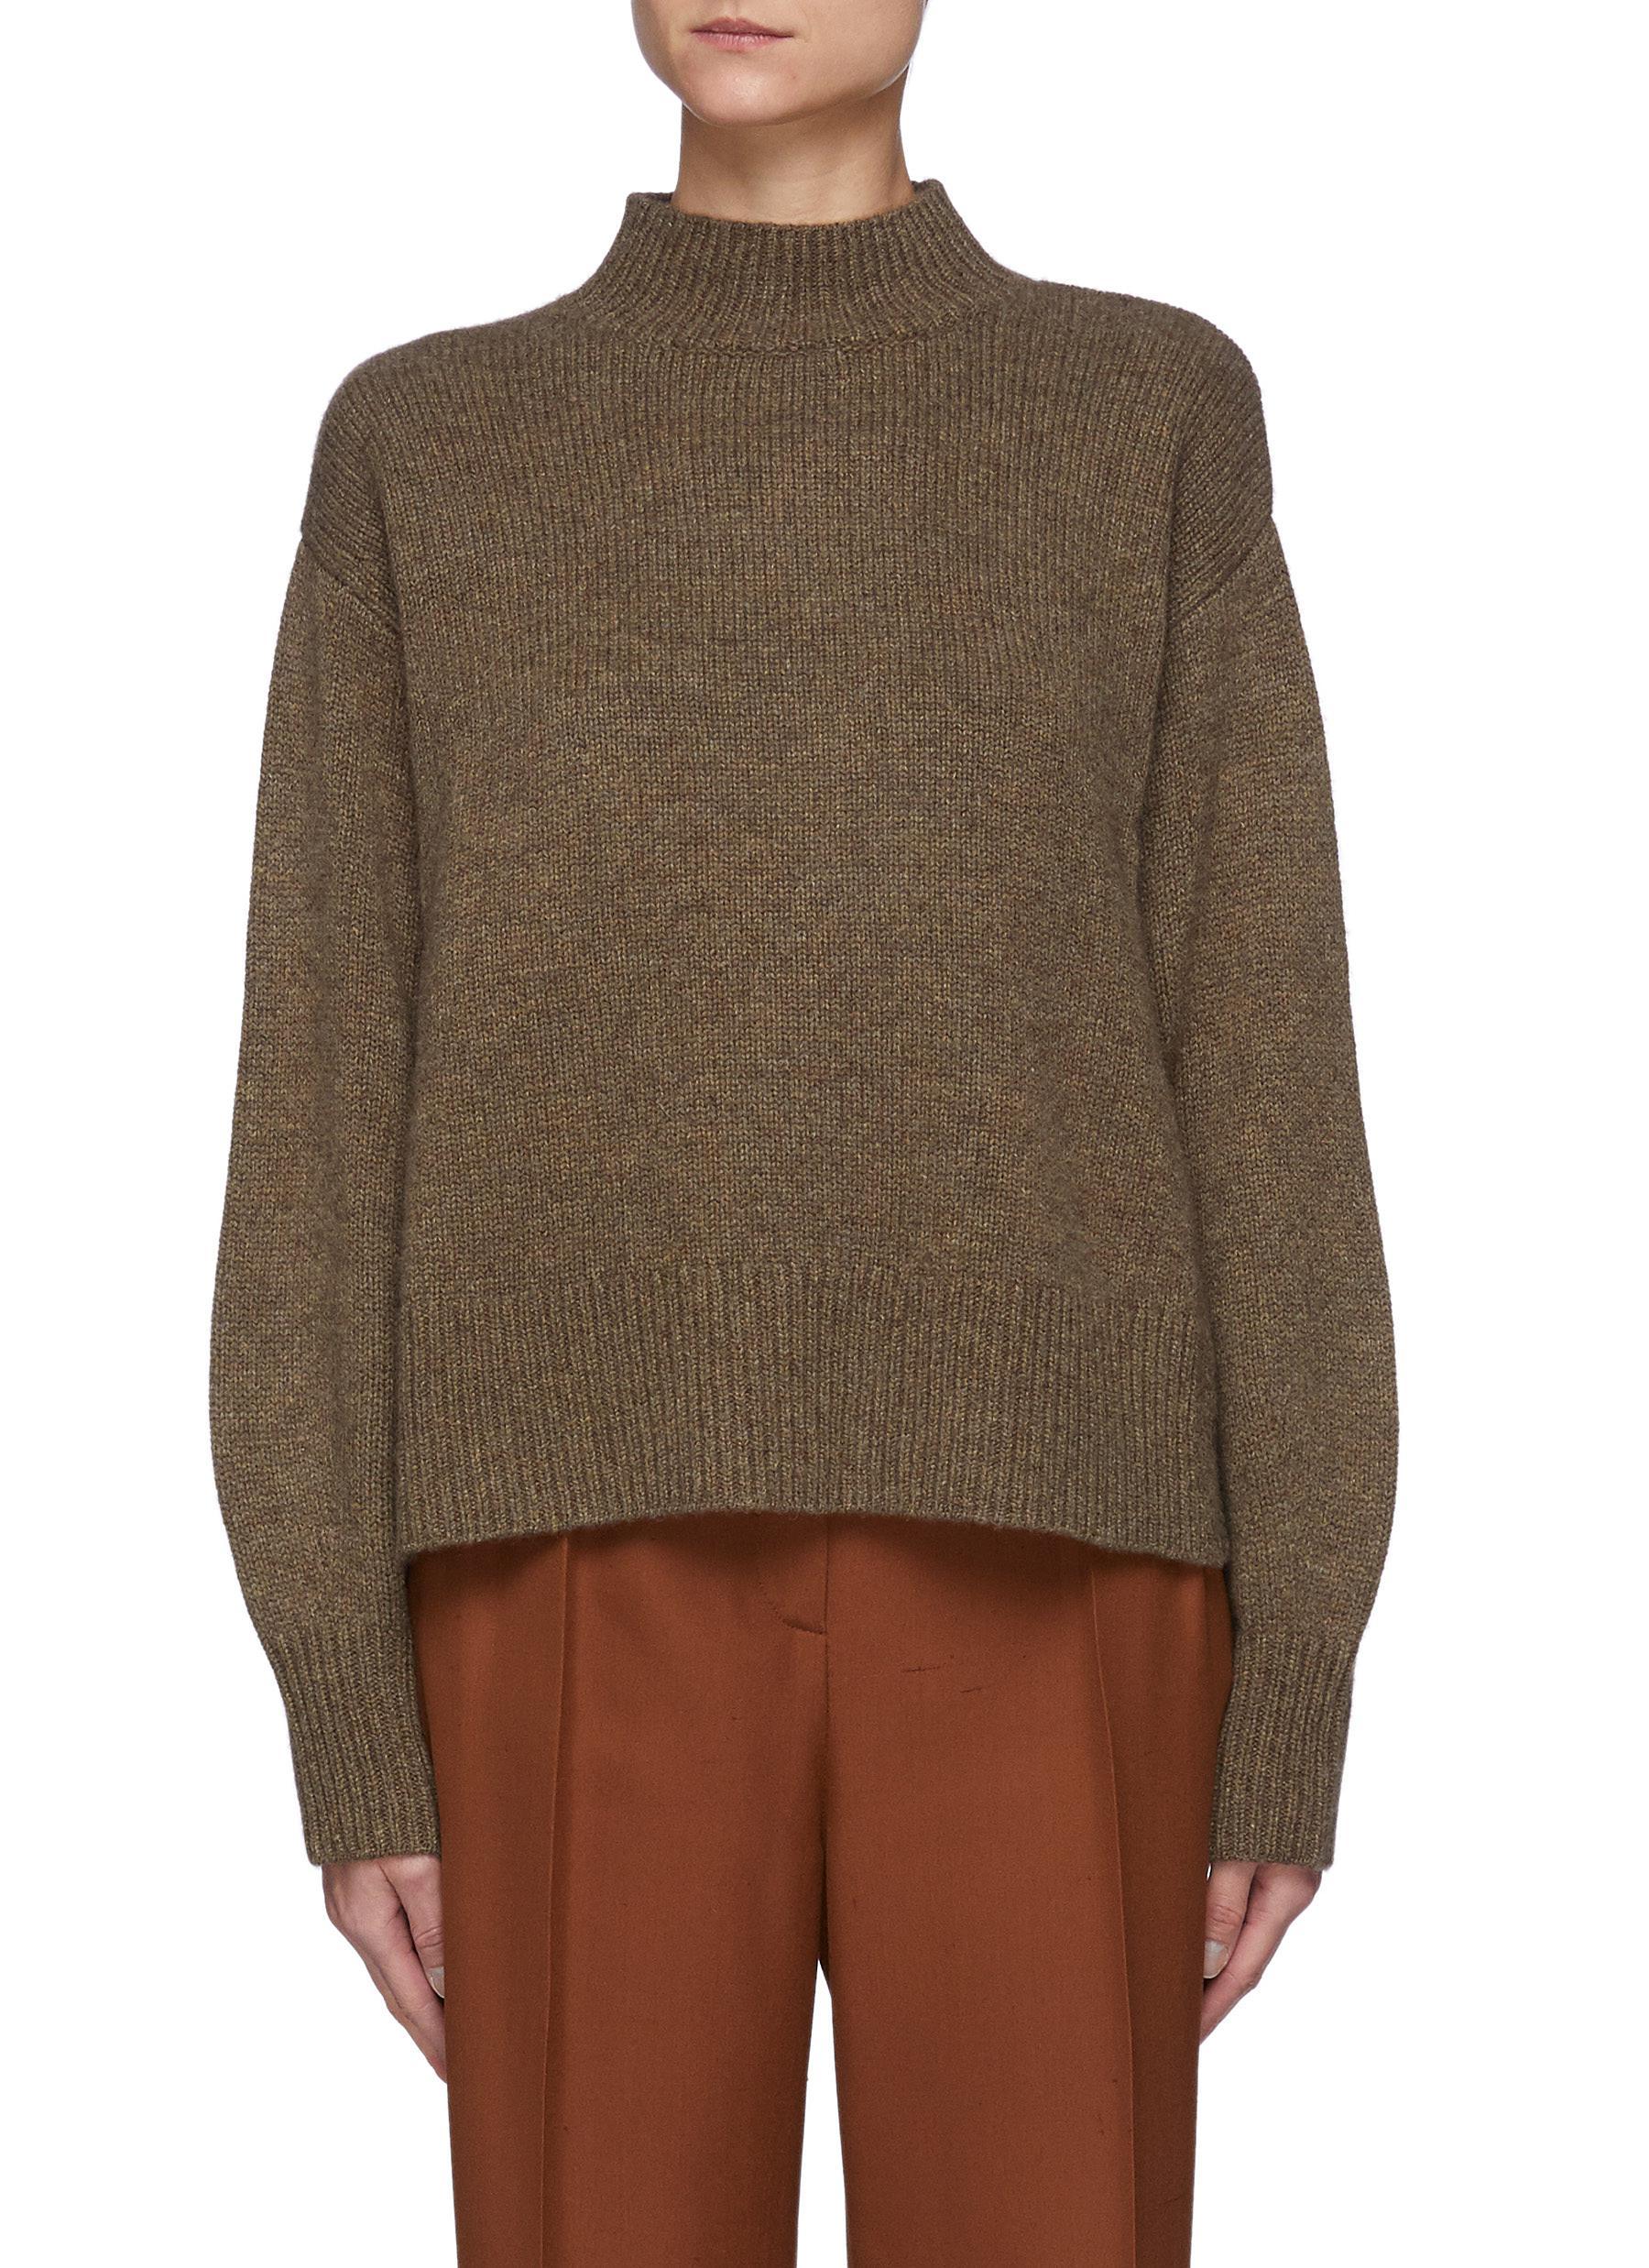 Osaka' Open Sides Low Neck Sweater